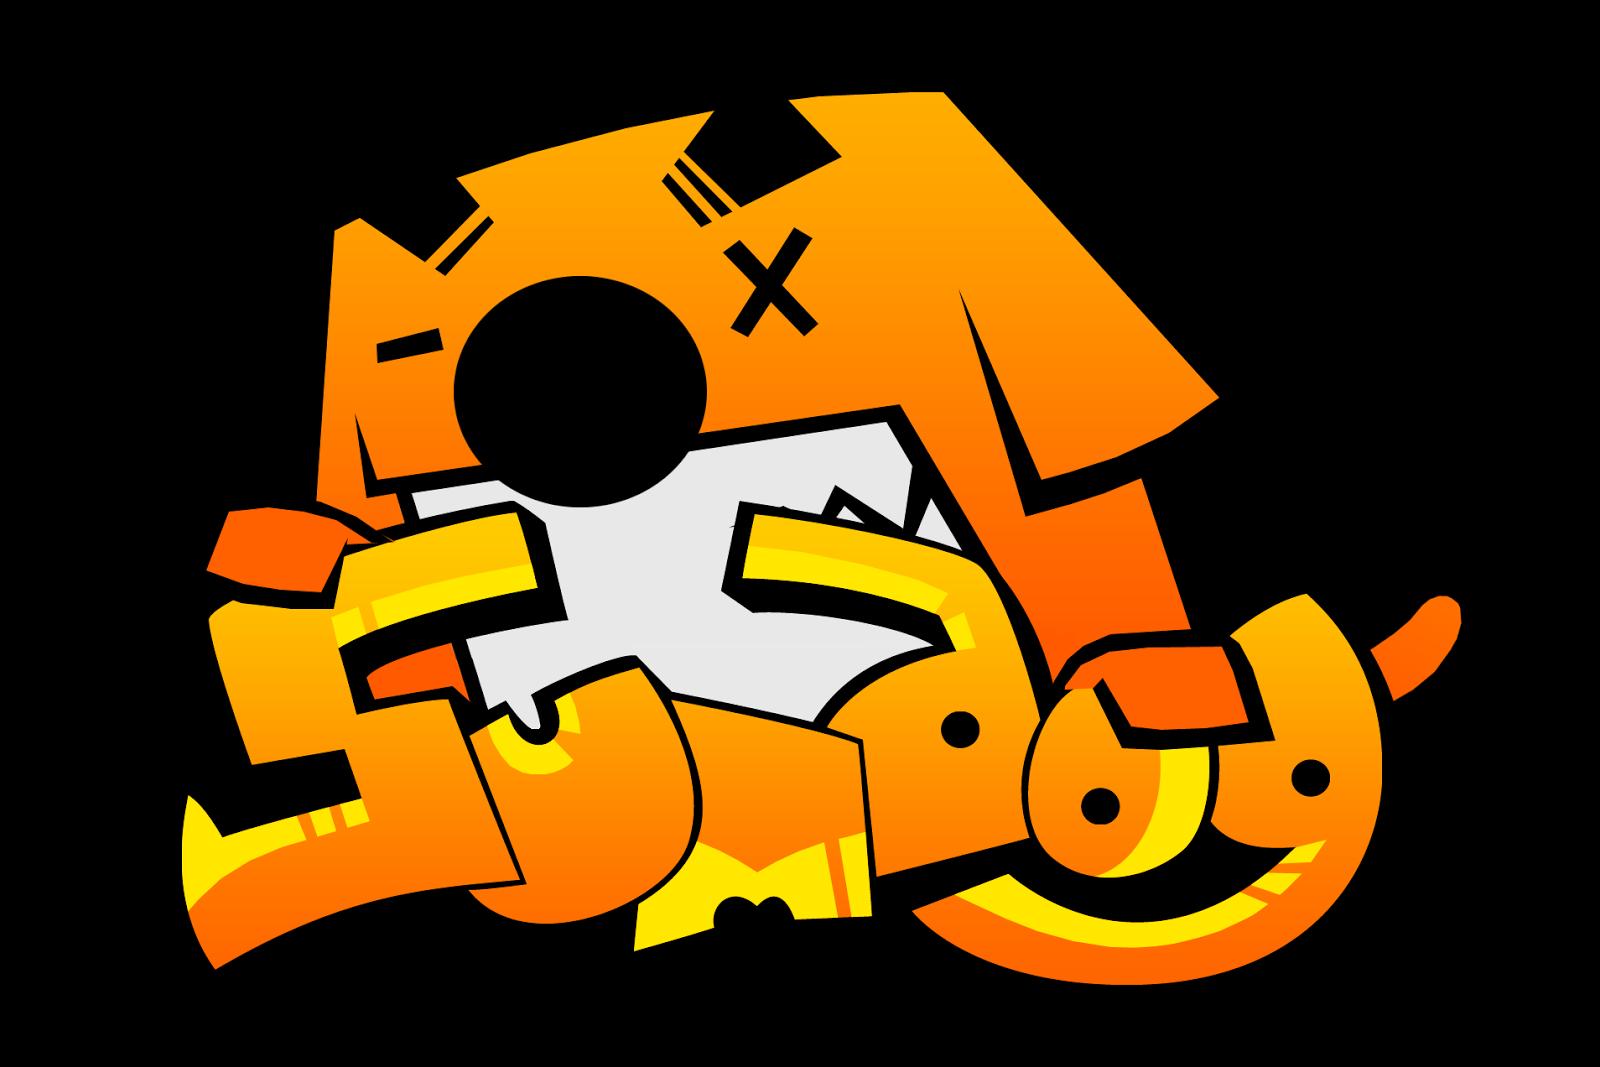 Click here to play Sumdog